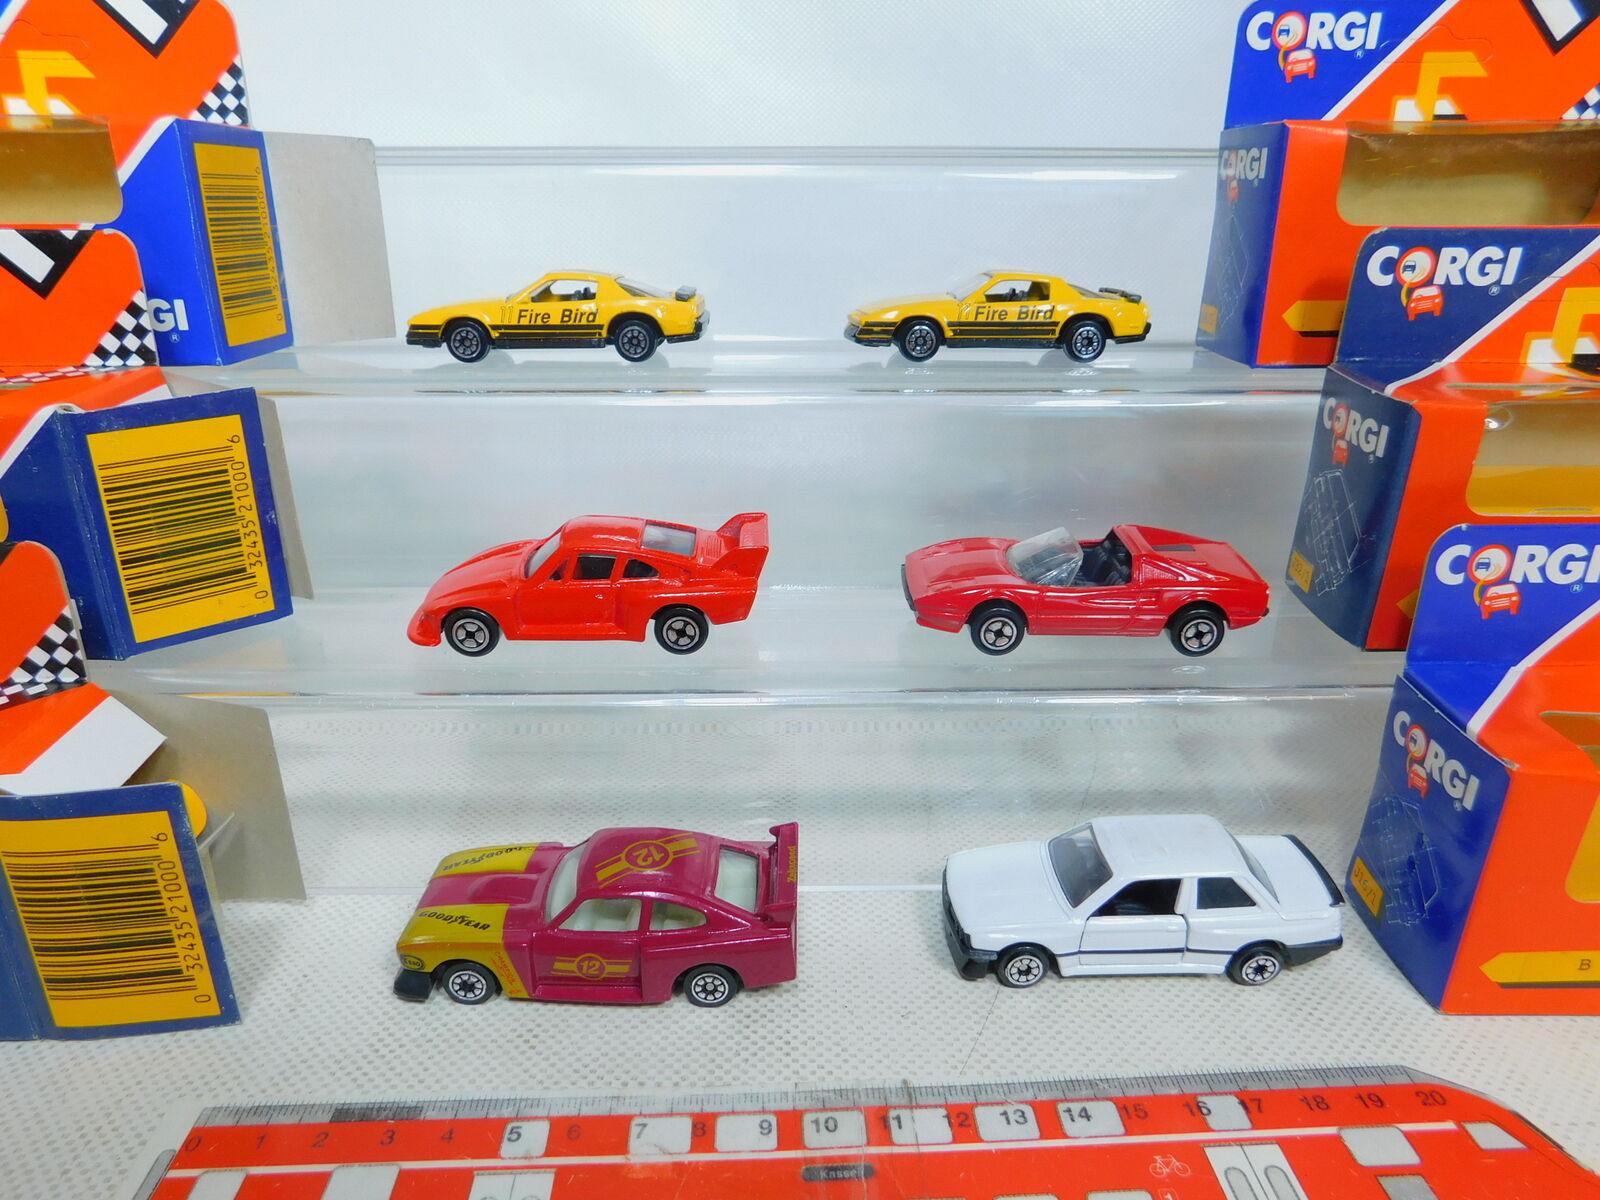 By330-1  6x CORGI 1 43 voiture  Ferrari Ferrari Ferrari  Porsche  BMW  PONTIAC  Ford, neuf dans sa boîte a387f7